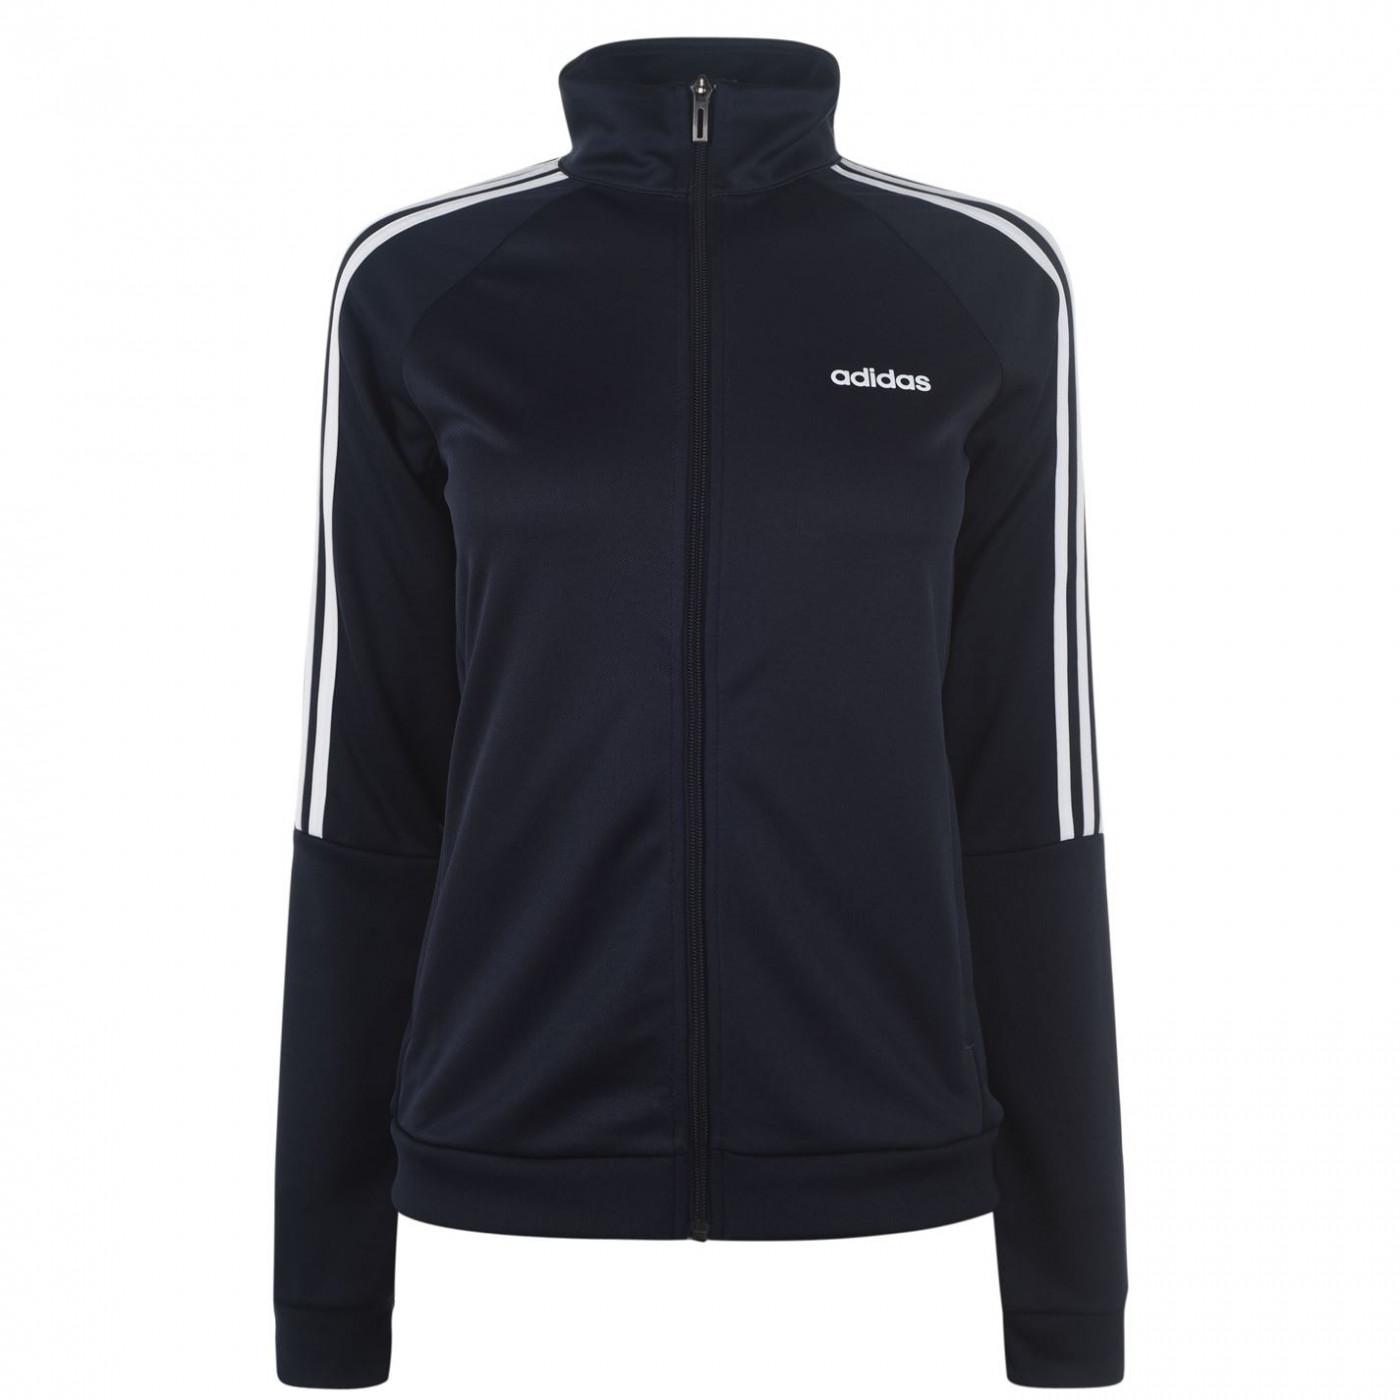 Adidas 3S Tracktop Lds 00